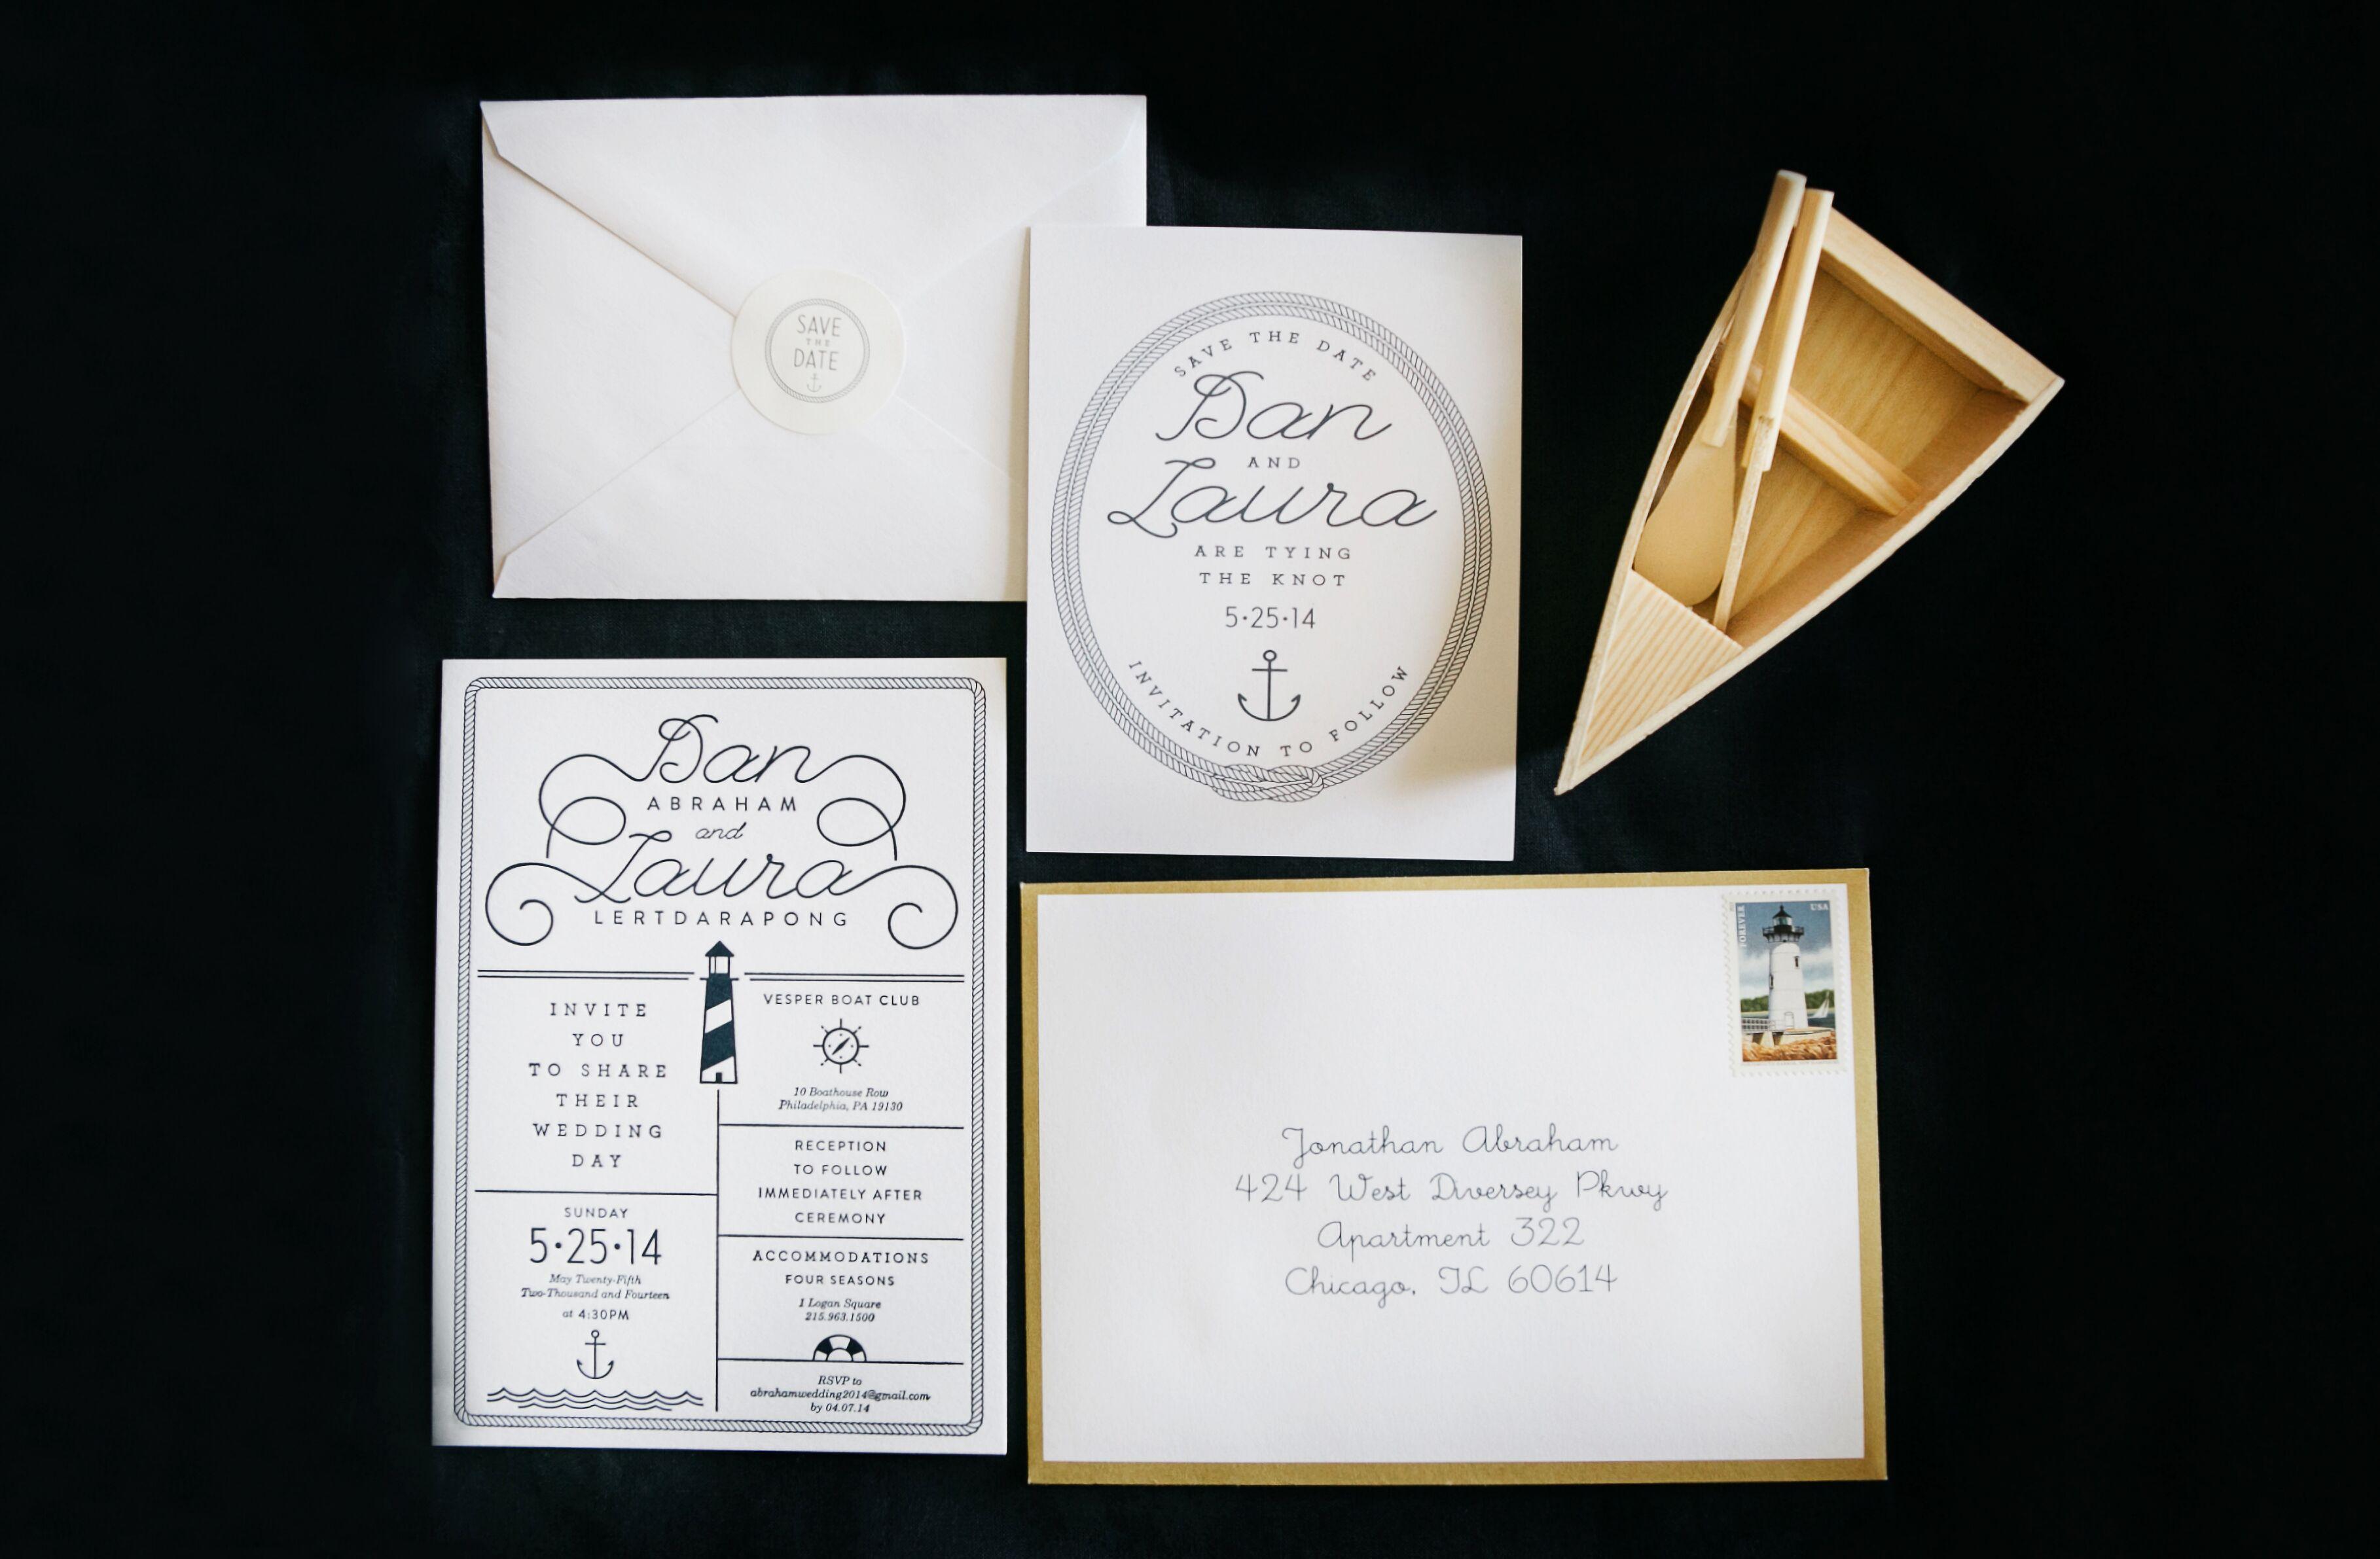 Navy Blue And White Wedding Invitations: Navy Blue, Gold And White Wedding Invitations